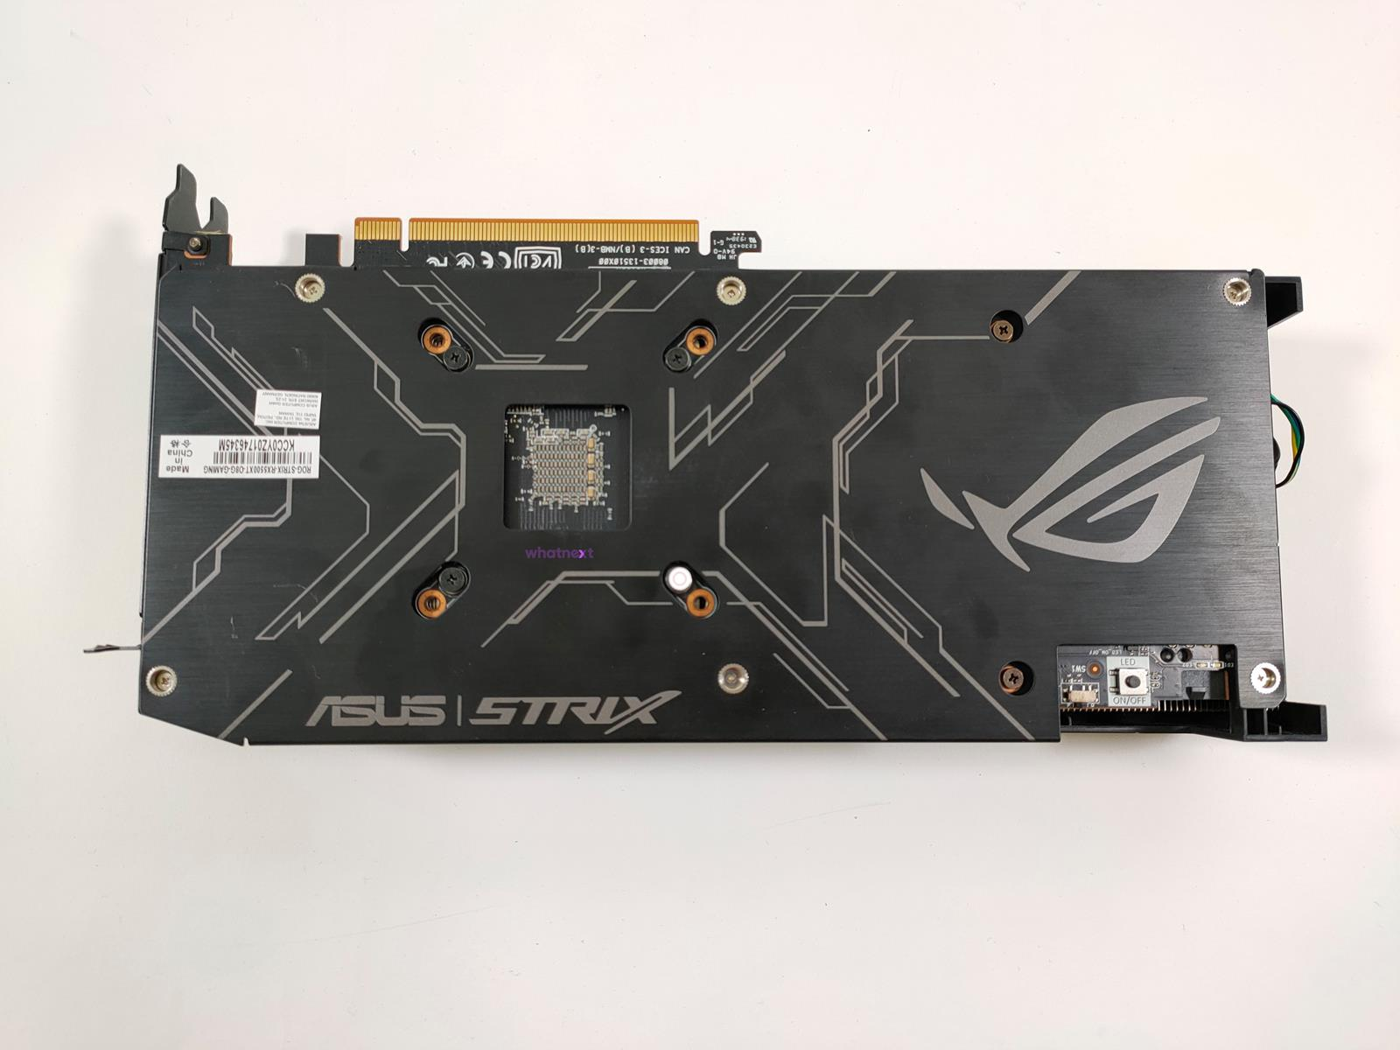 test ASUS Radeon RX 5500 XT Strix Gaming OC, recenzja ASUS Radeon RX 5500 XT Strix Gaming OC review ASUS Radeon RX 5500 XT Strix Gaming OC opinia ASUS Radeon RX 5500 XT Strix Gaming OC